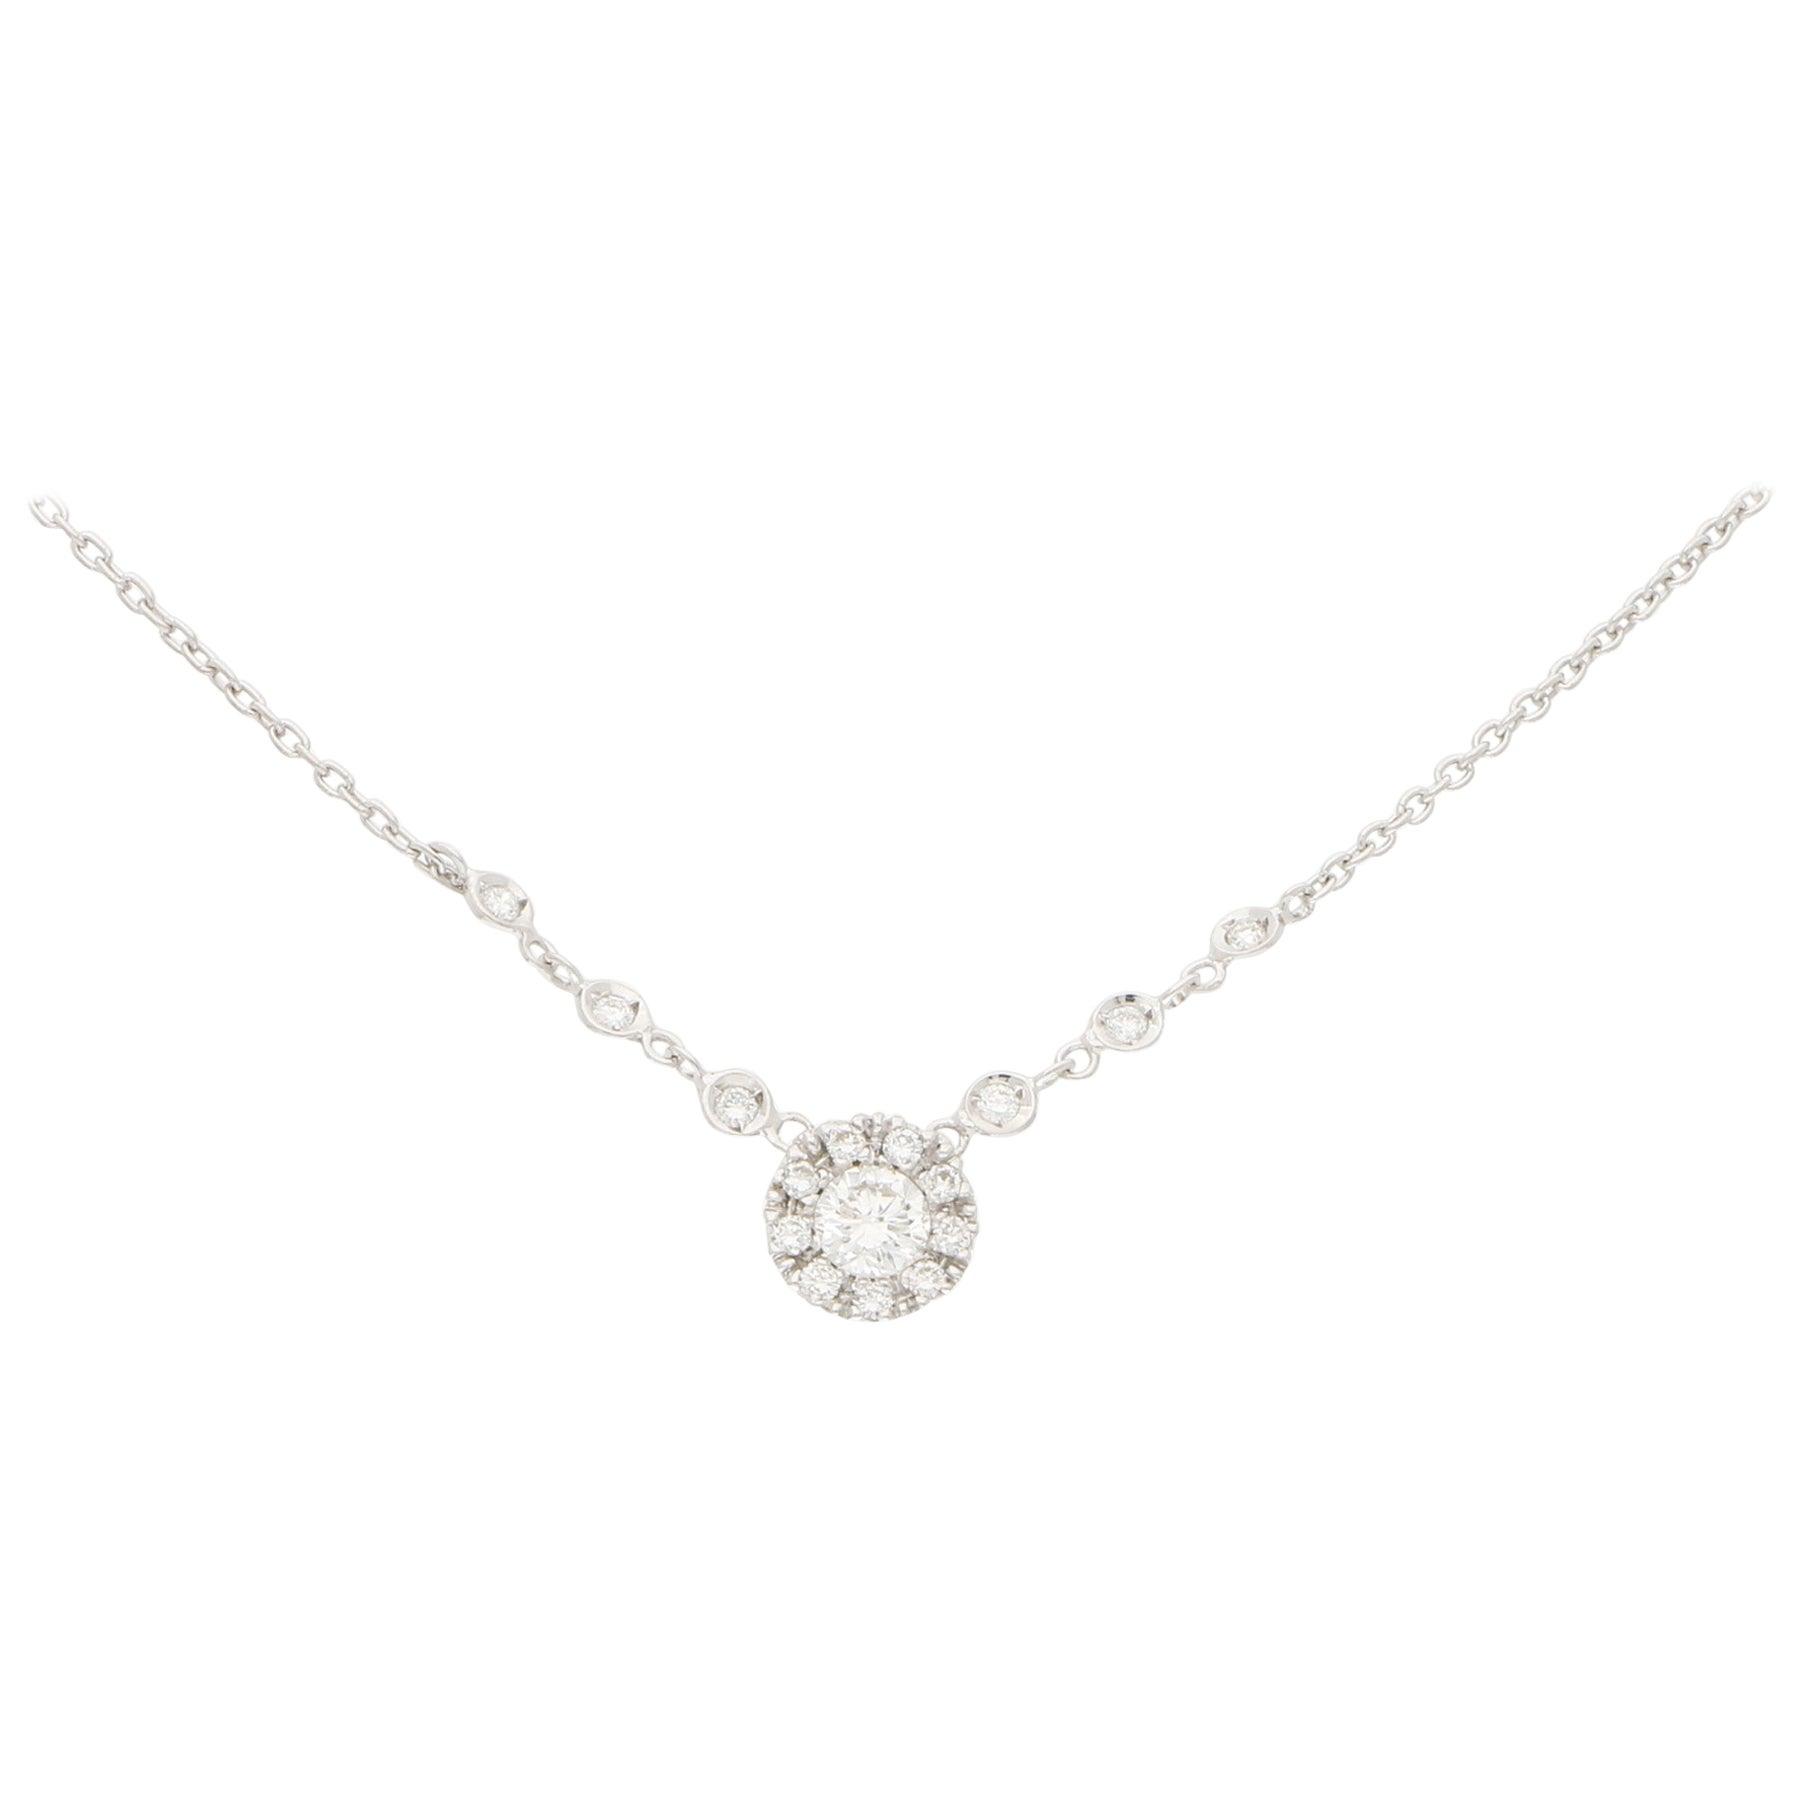 Diamond Halo Cluster Pendant in 18 Karat White Gold